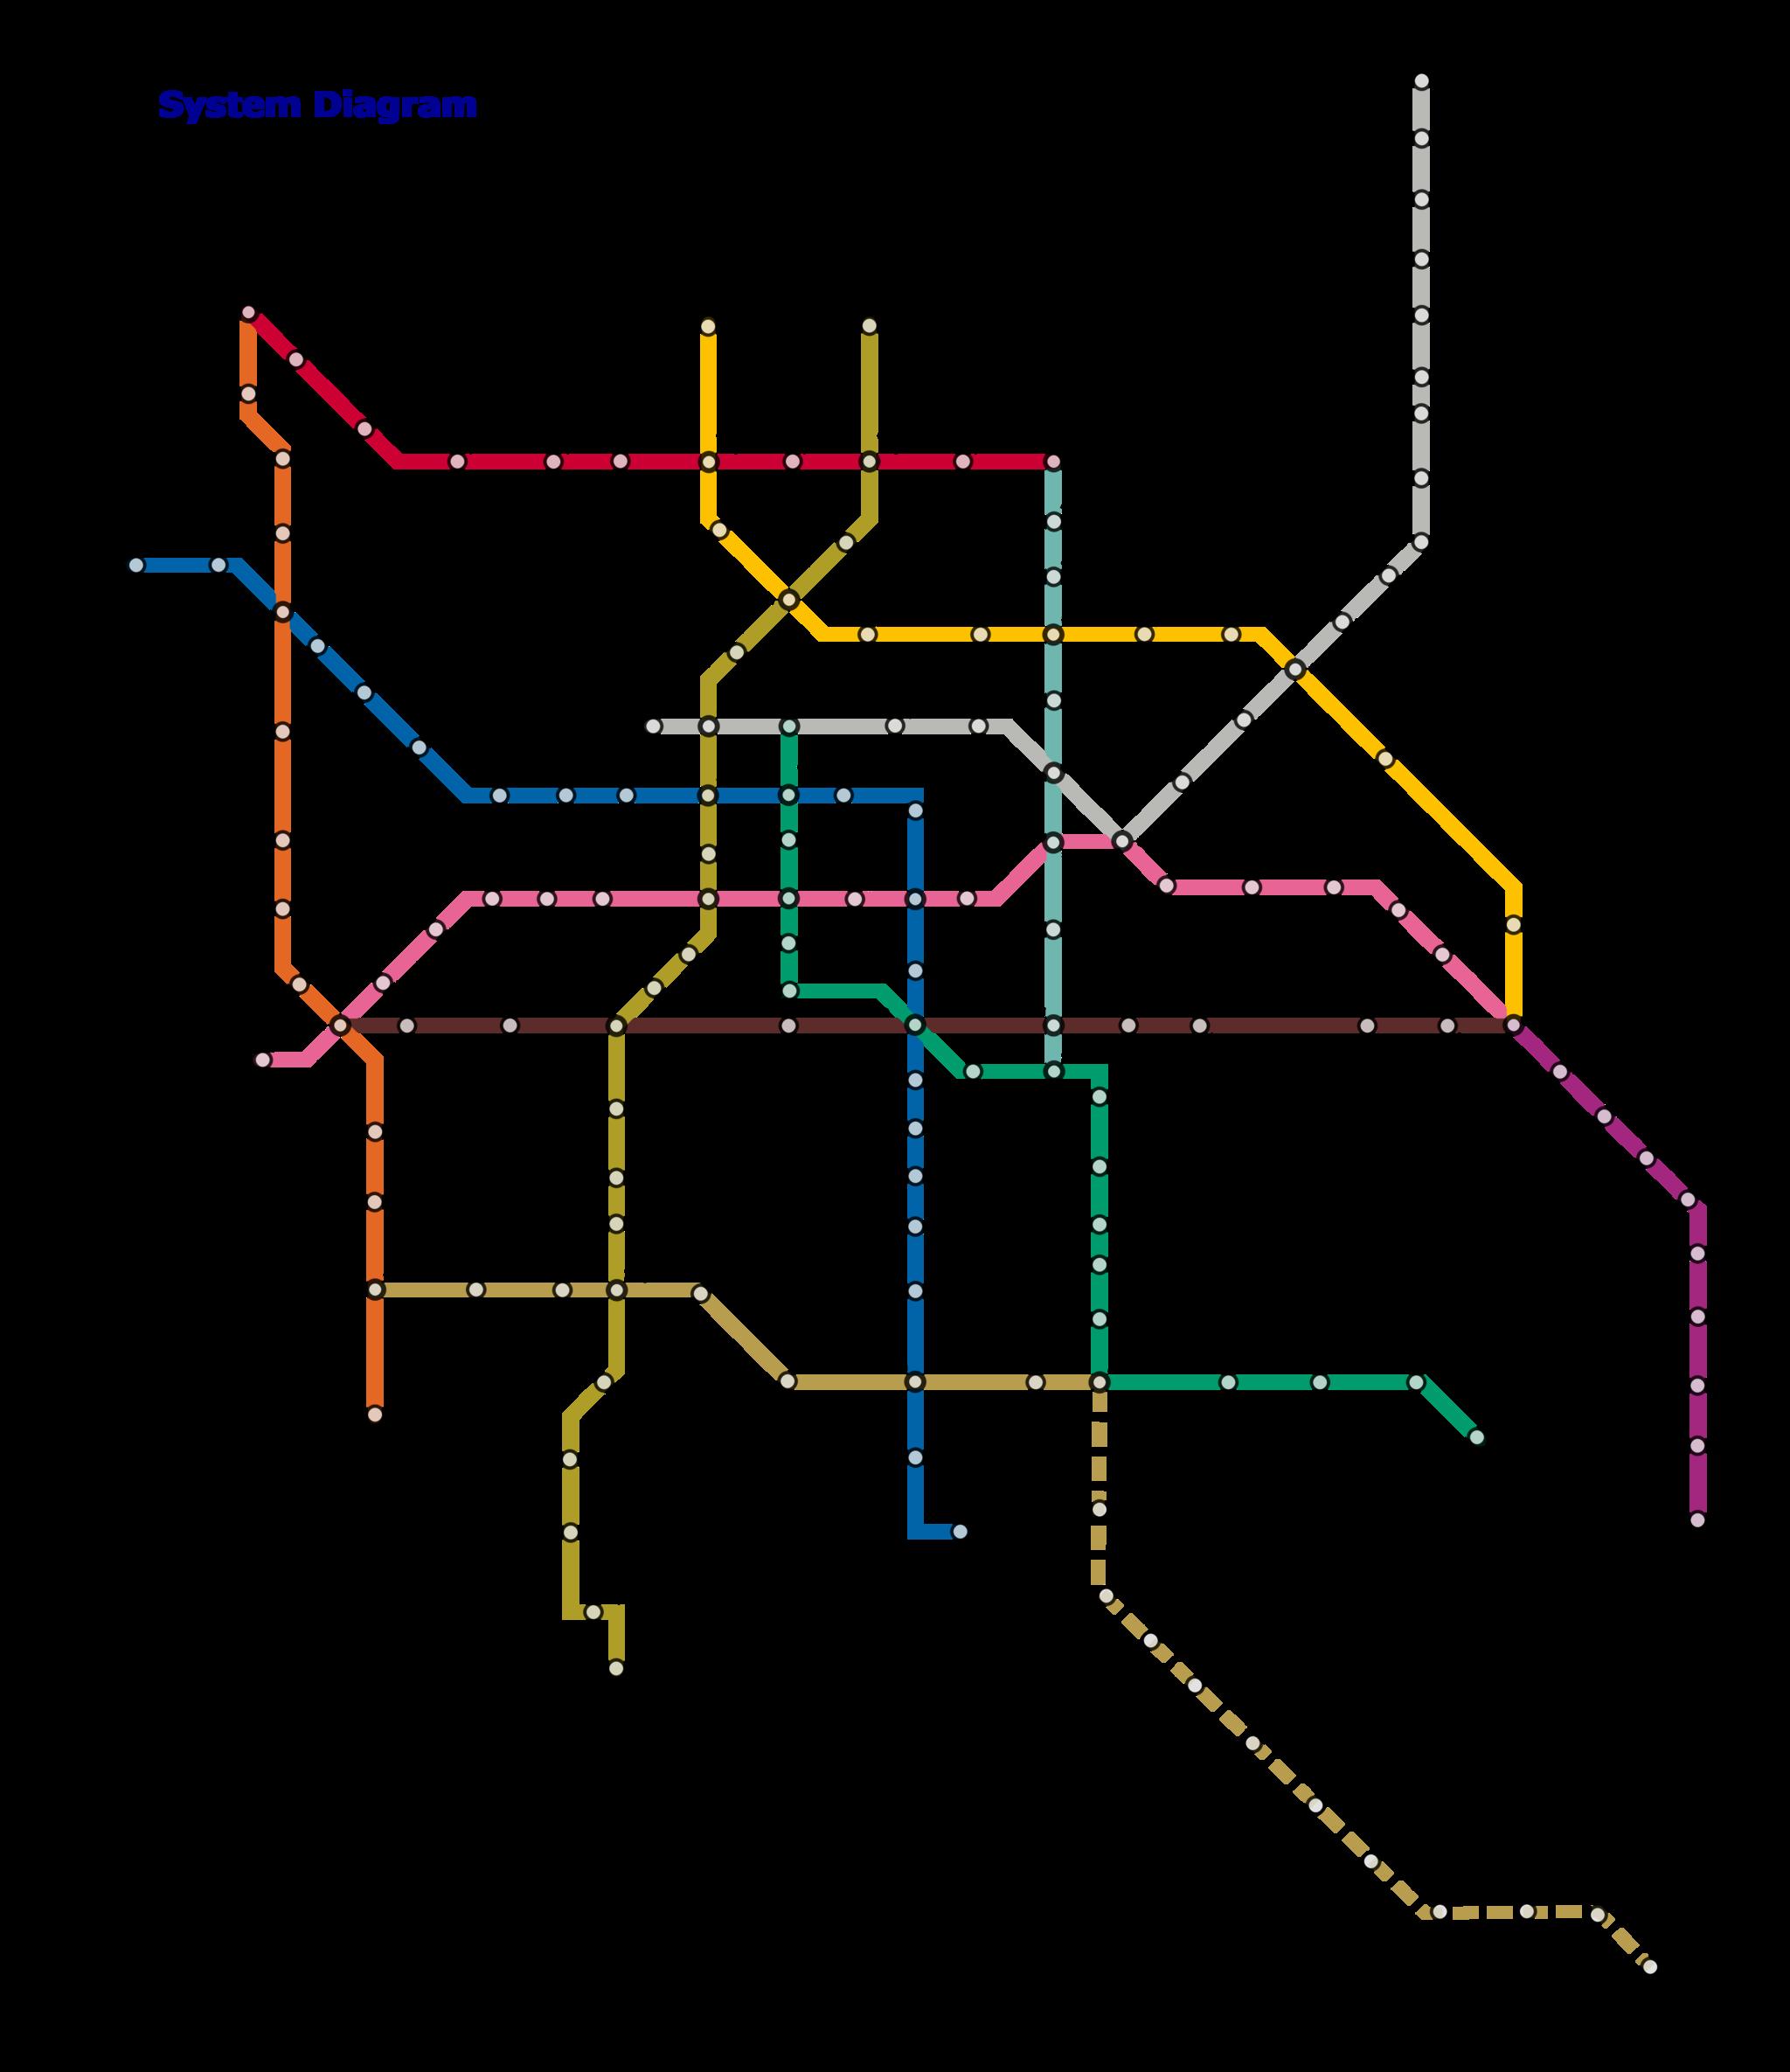 Metro map | © Fluence/WikiCommons